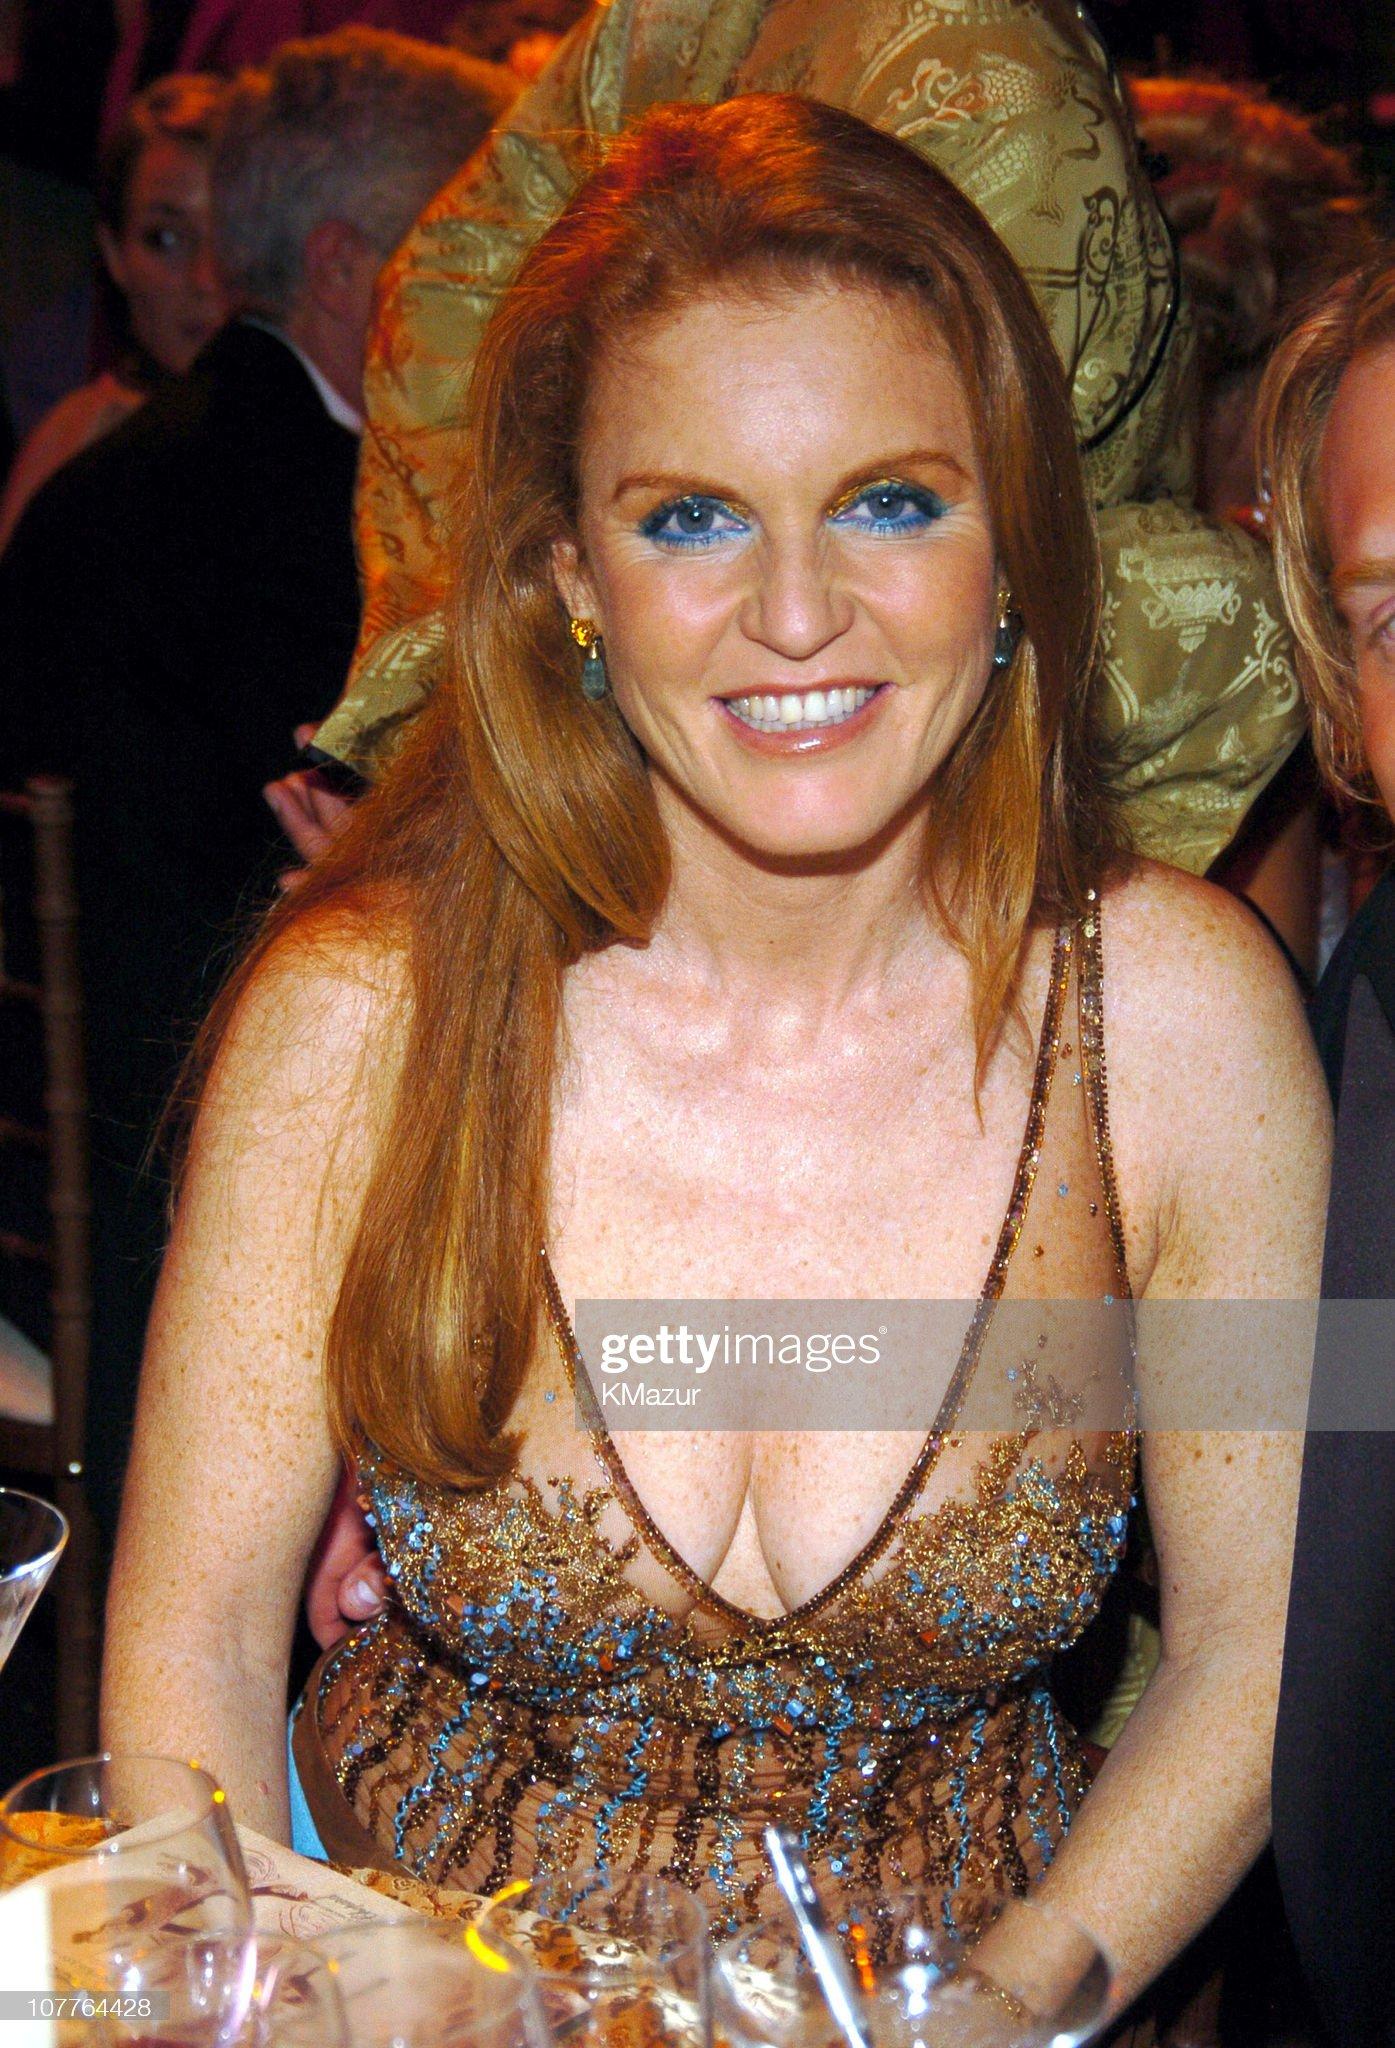 Вечерние наряды Отем пока еще Филлипс и Сары Йоркской The 6th Annual White Tie & Tiara Ball to Benefit the Elton John Aids Foundation in Association with Chopard - Dinner : News Photo